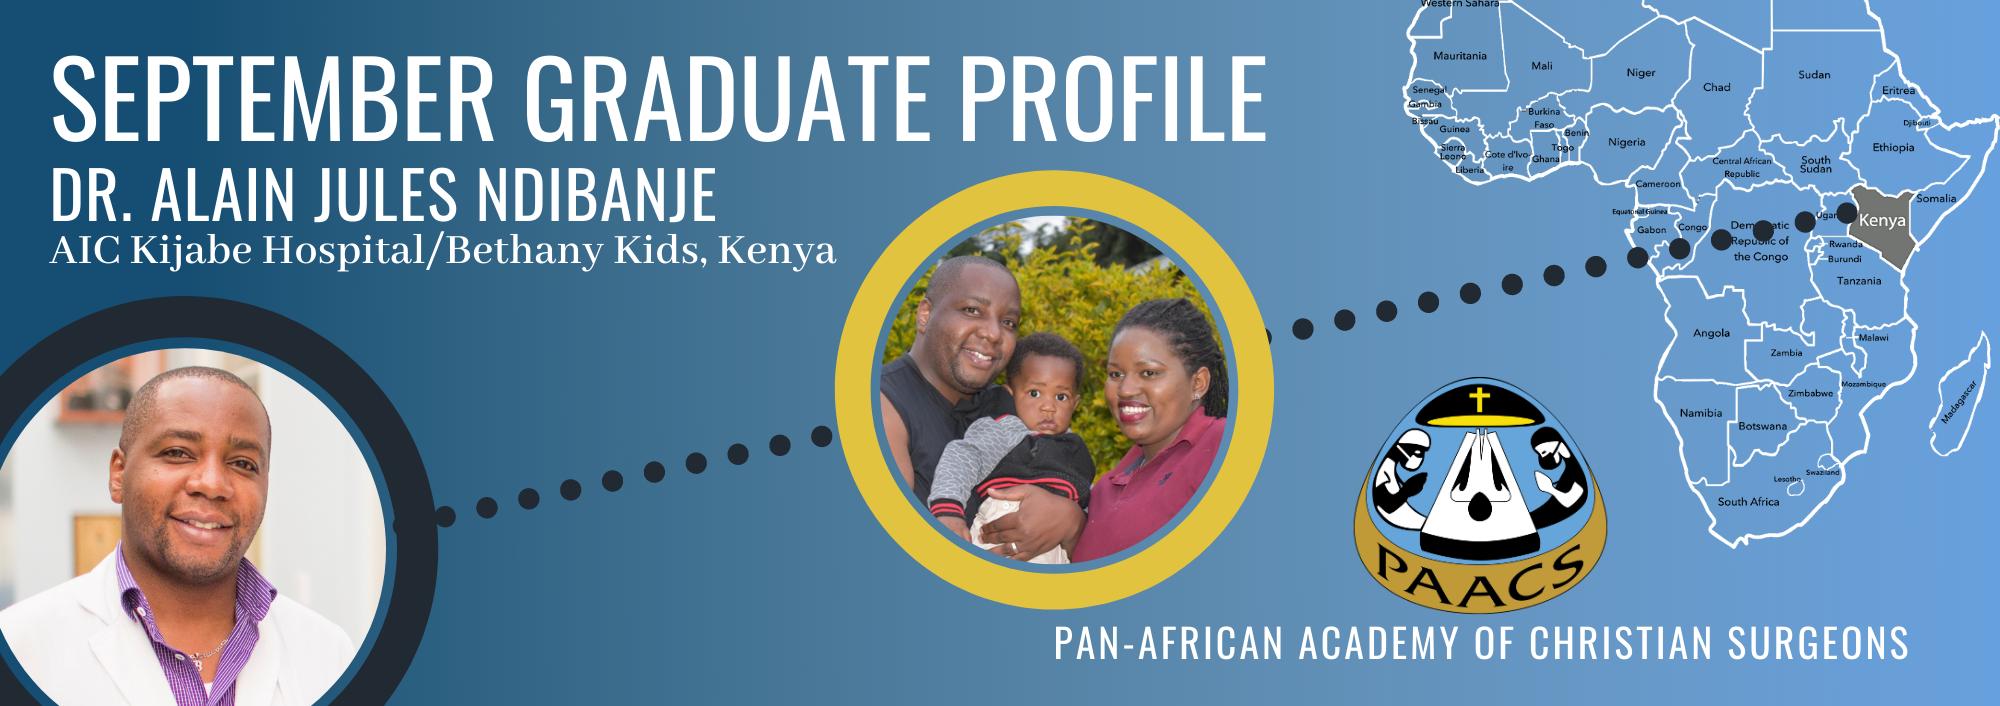 Graduate Profile: Dr. Alain Jules Ndibenje